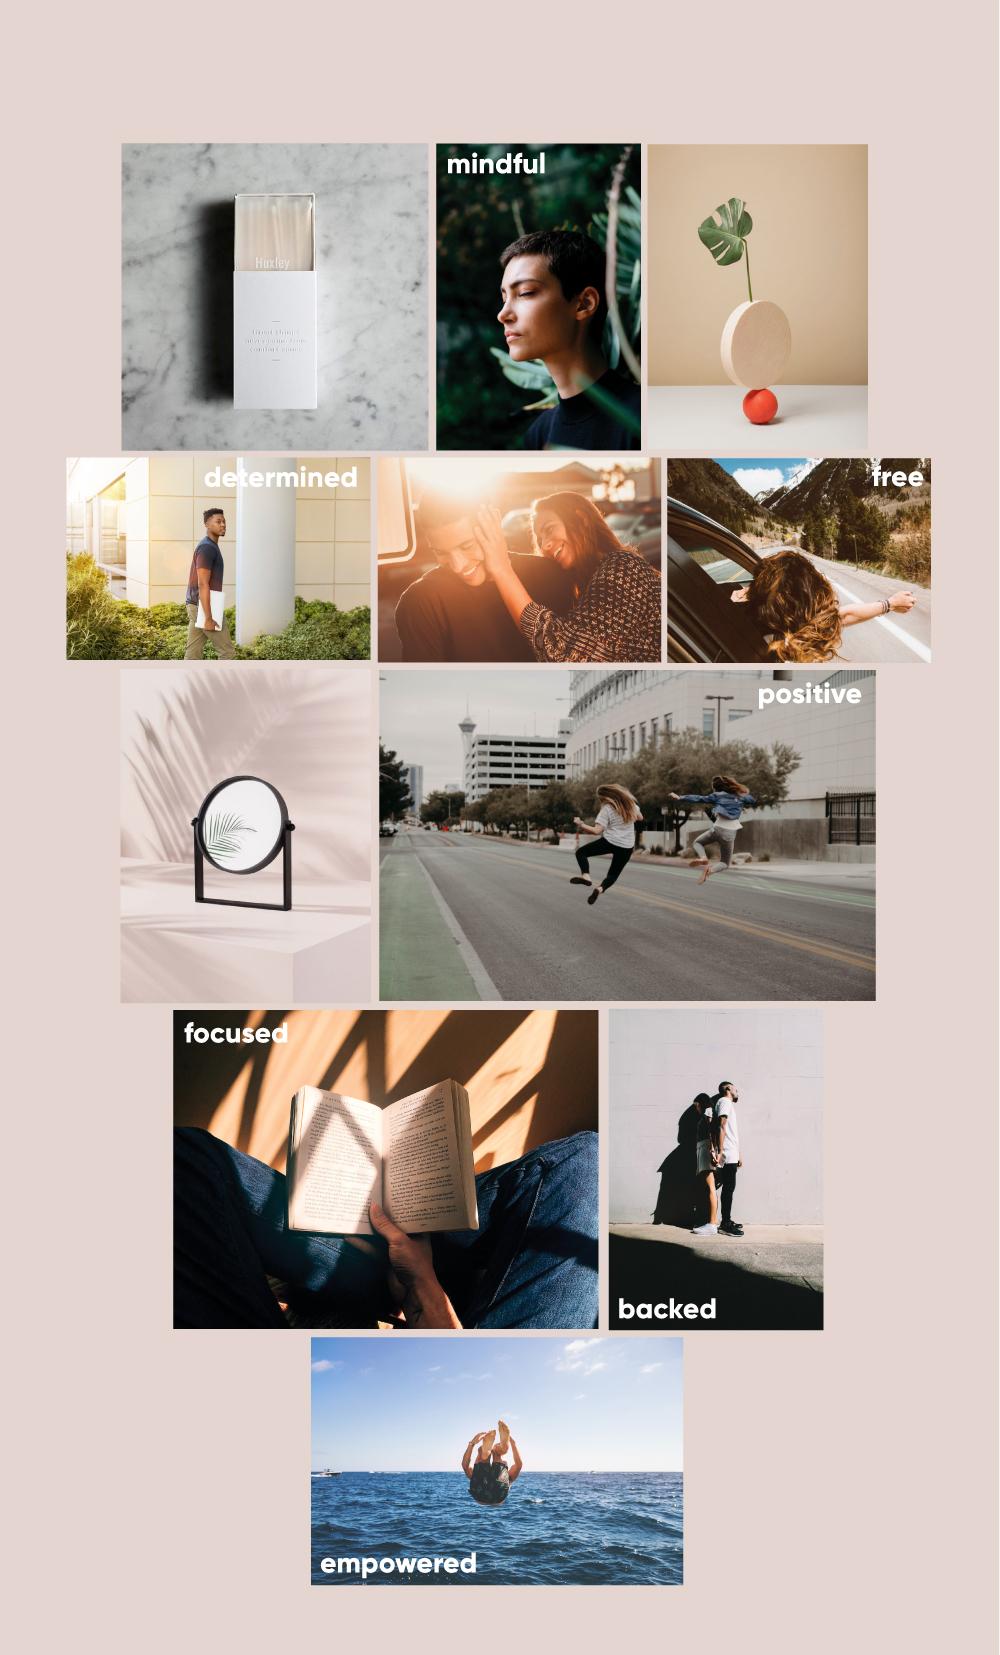 01_Mantra-moodboard.jpg